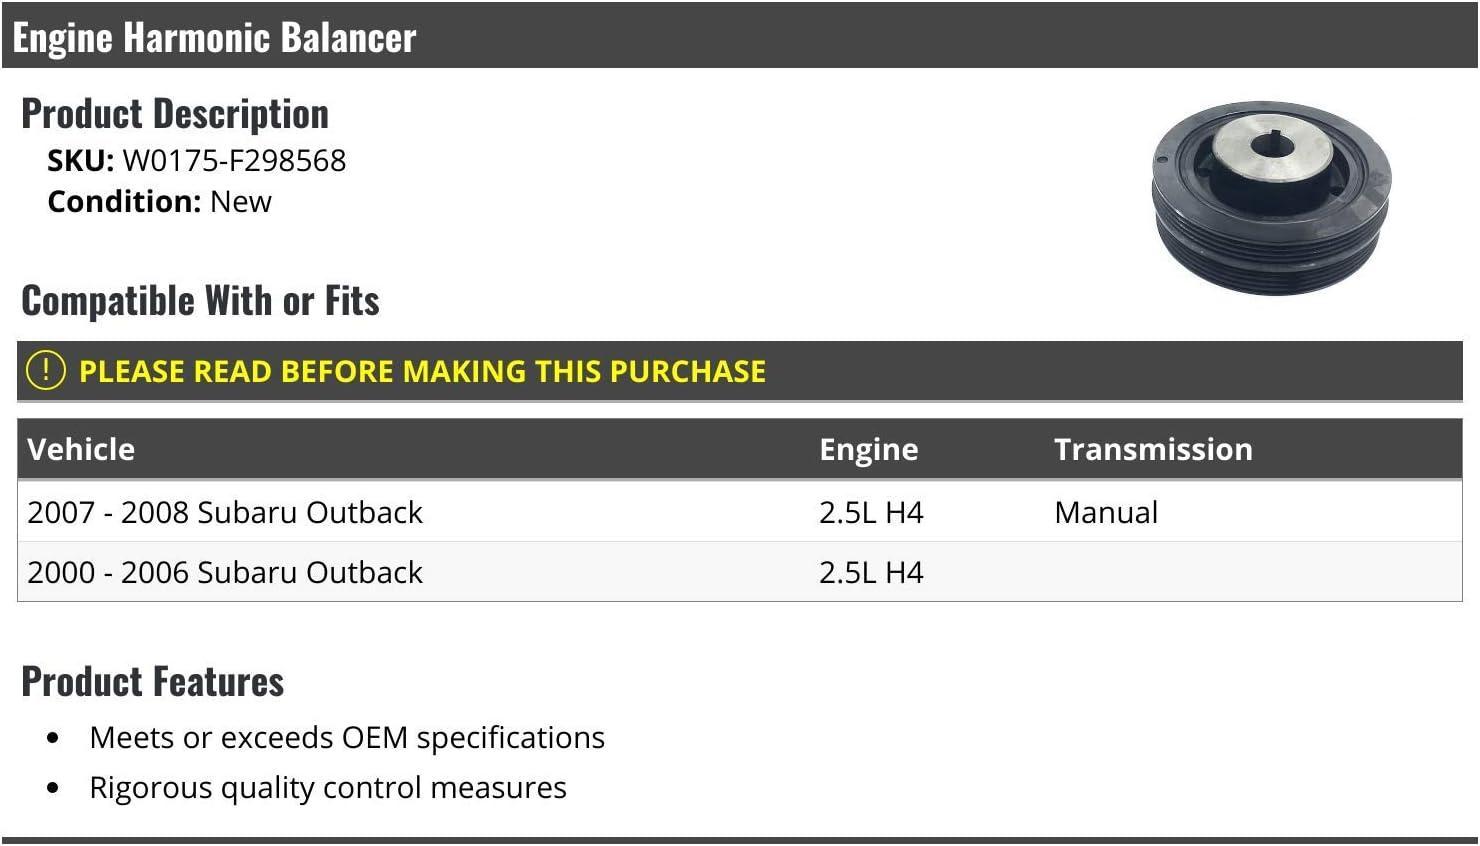 Engine Harmonic Balancer Compatible with 2000-2008 Subaru Outback 2.5L 4-Cylinder